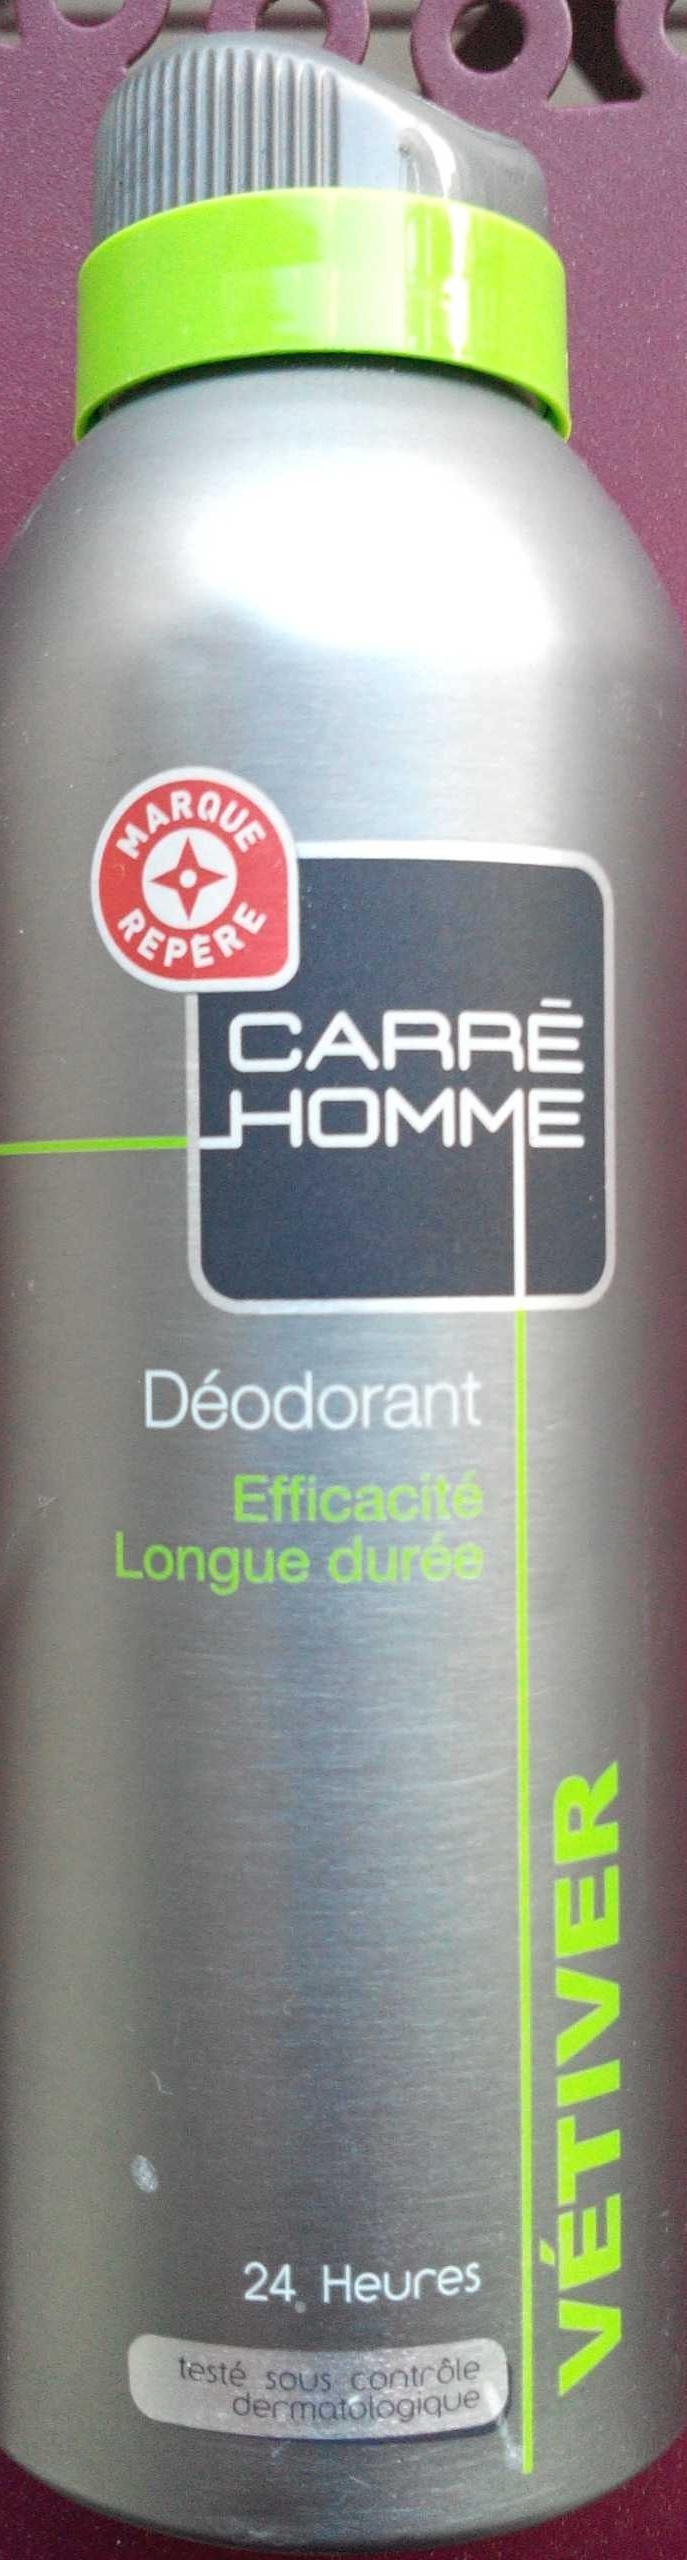 Déodorant Vétiver - Produit - fr